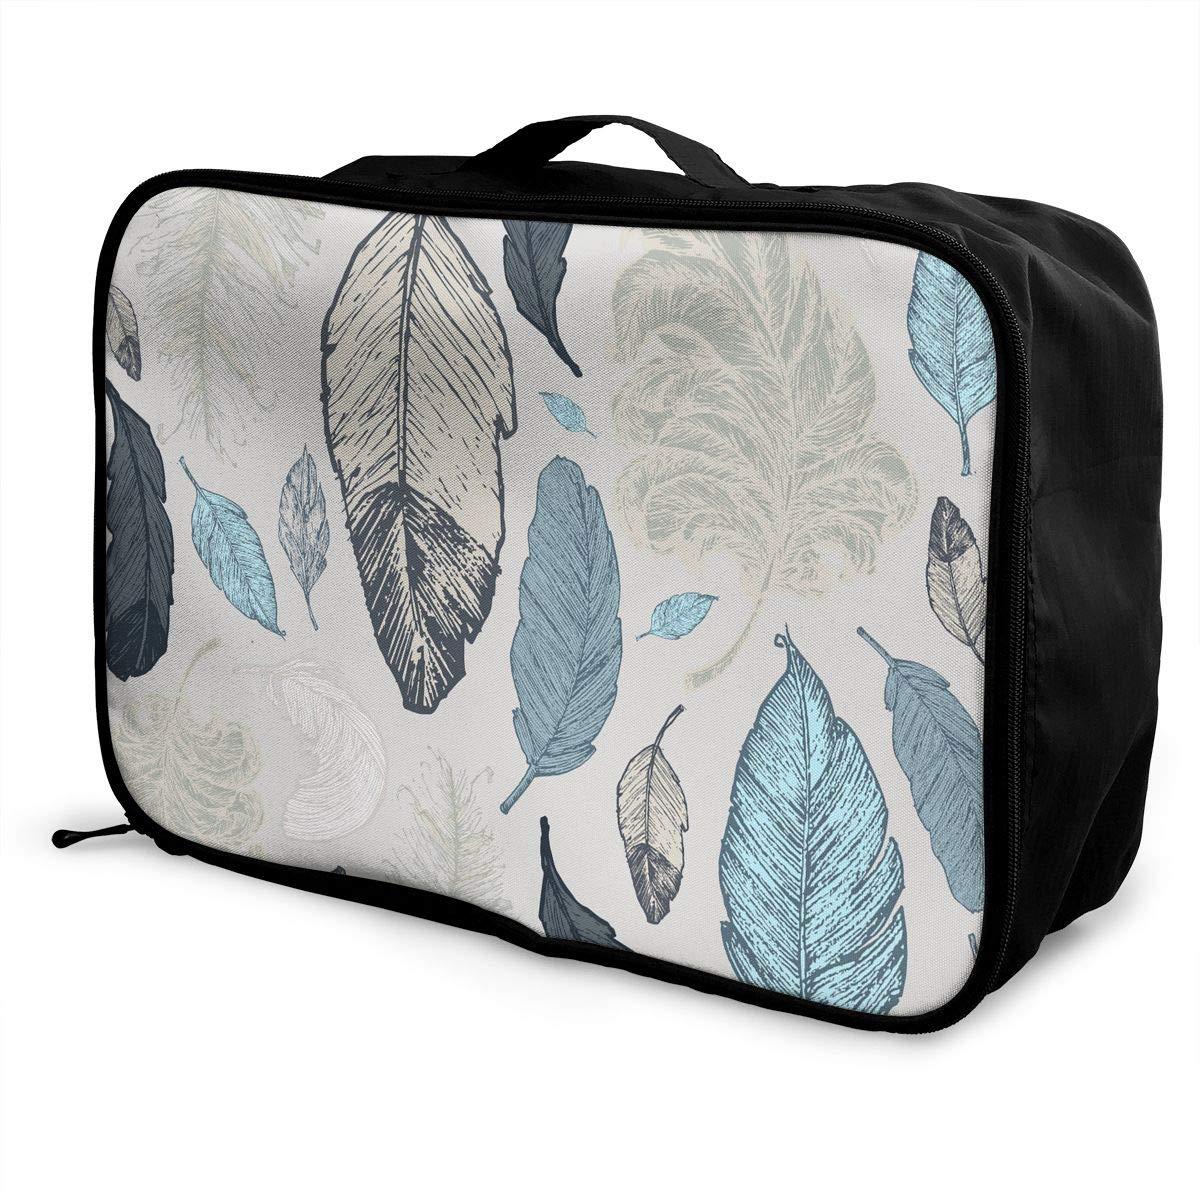 Travel Duffel Bag Waterproof Fashion Lightweight Large Capacity Portable Luggage Bag Beatuiful Feathers